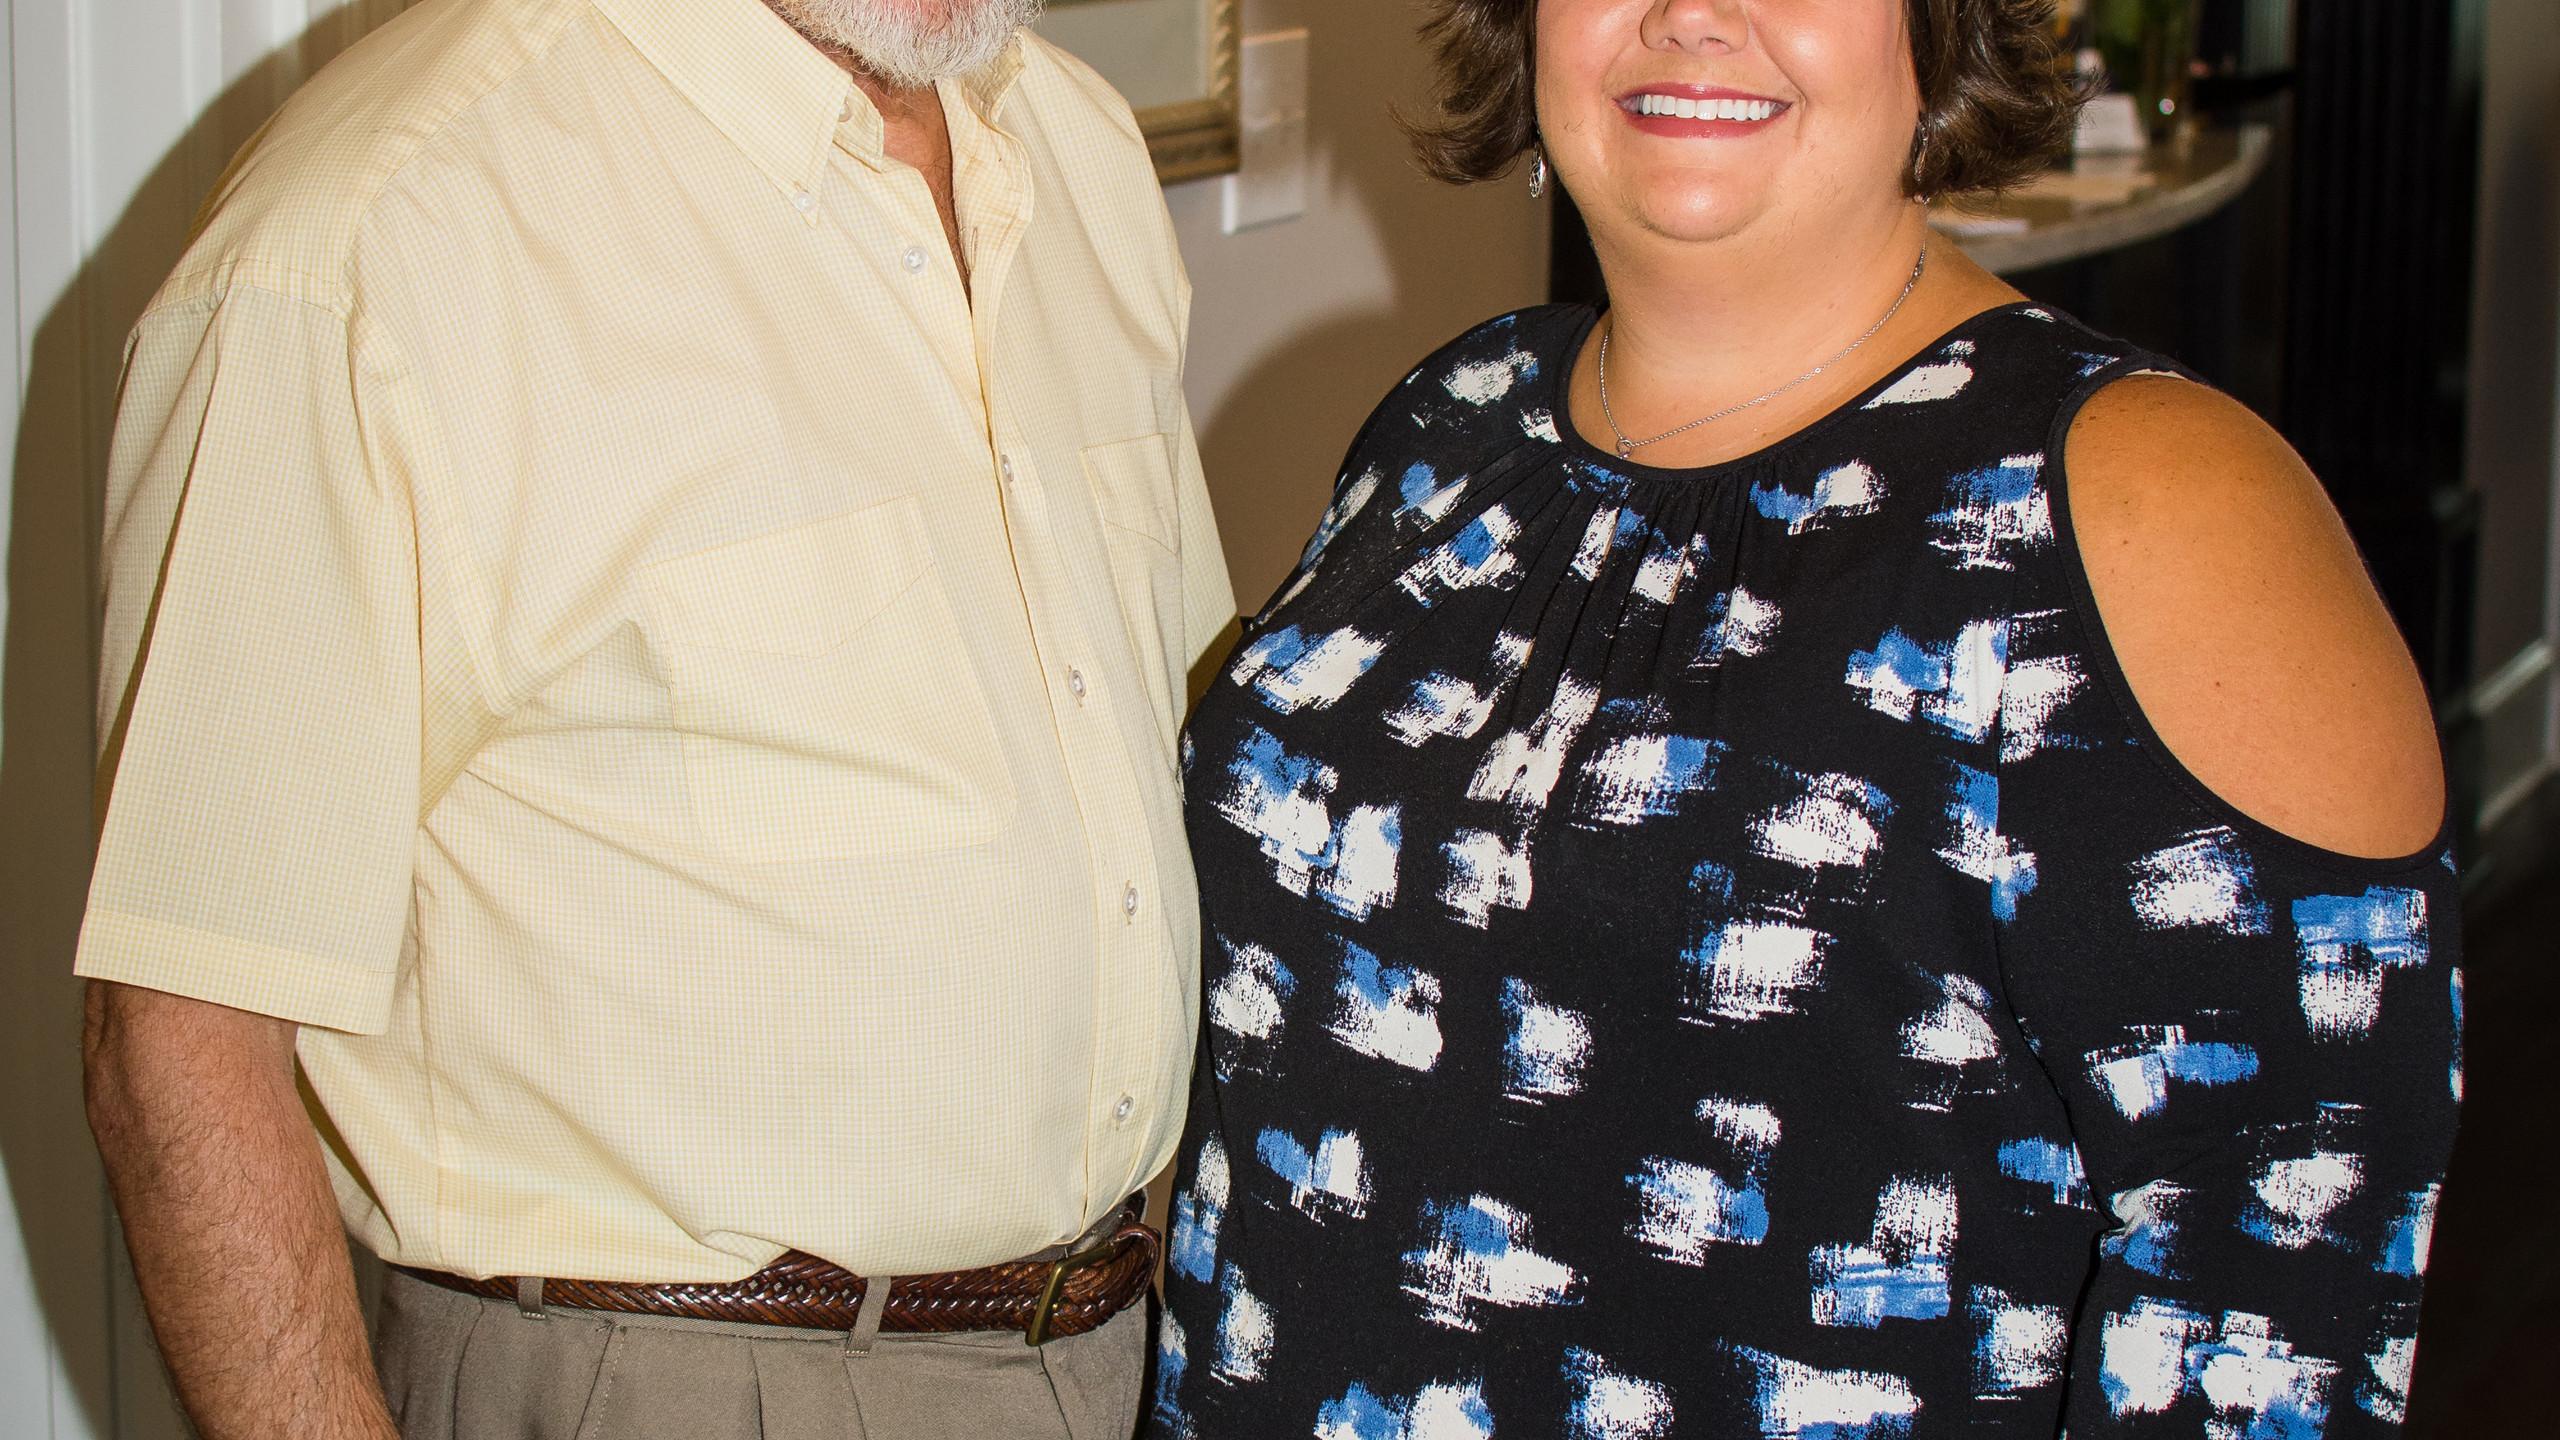 Don Malkowski and Michelle Malkowski